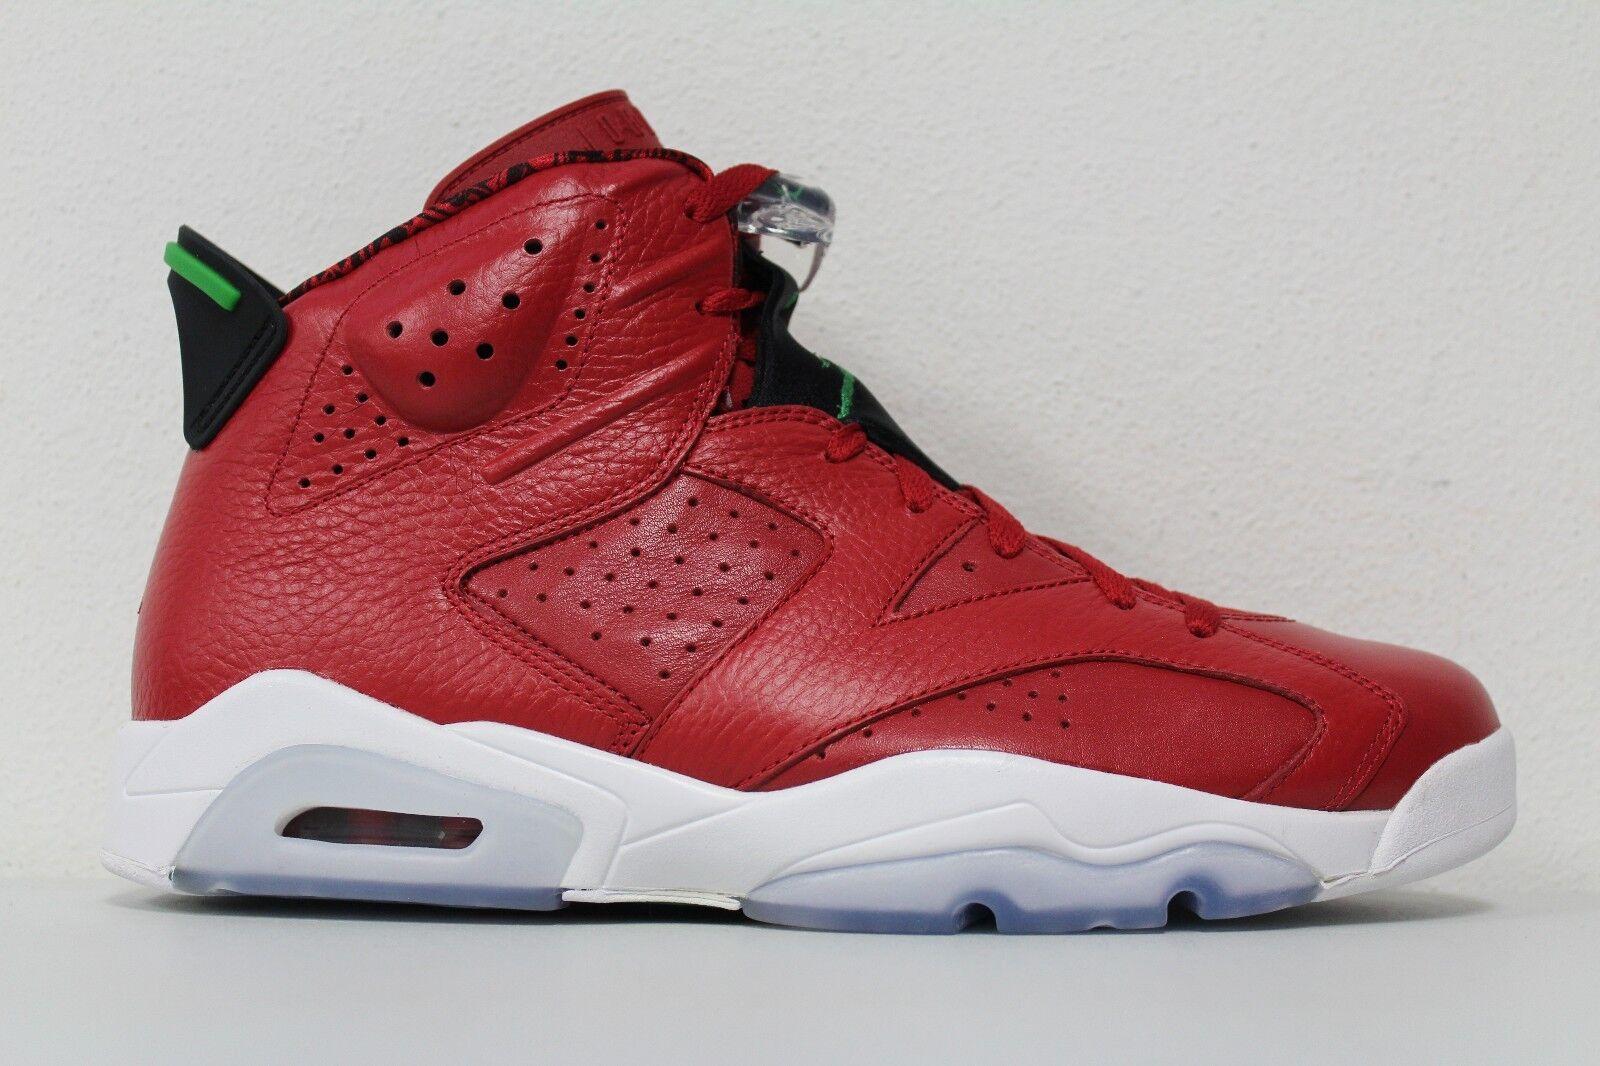 Nike Mens Air Jordan 6 Retro Size 11 Spizike Varsity Red Green VI 694091 625